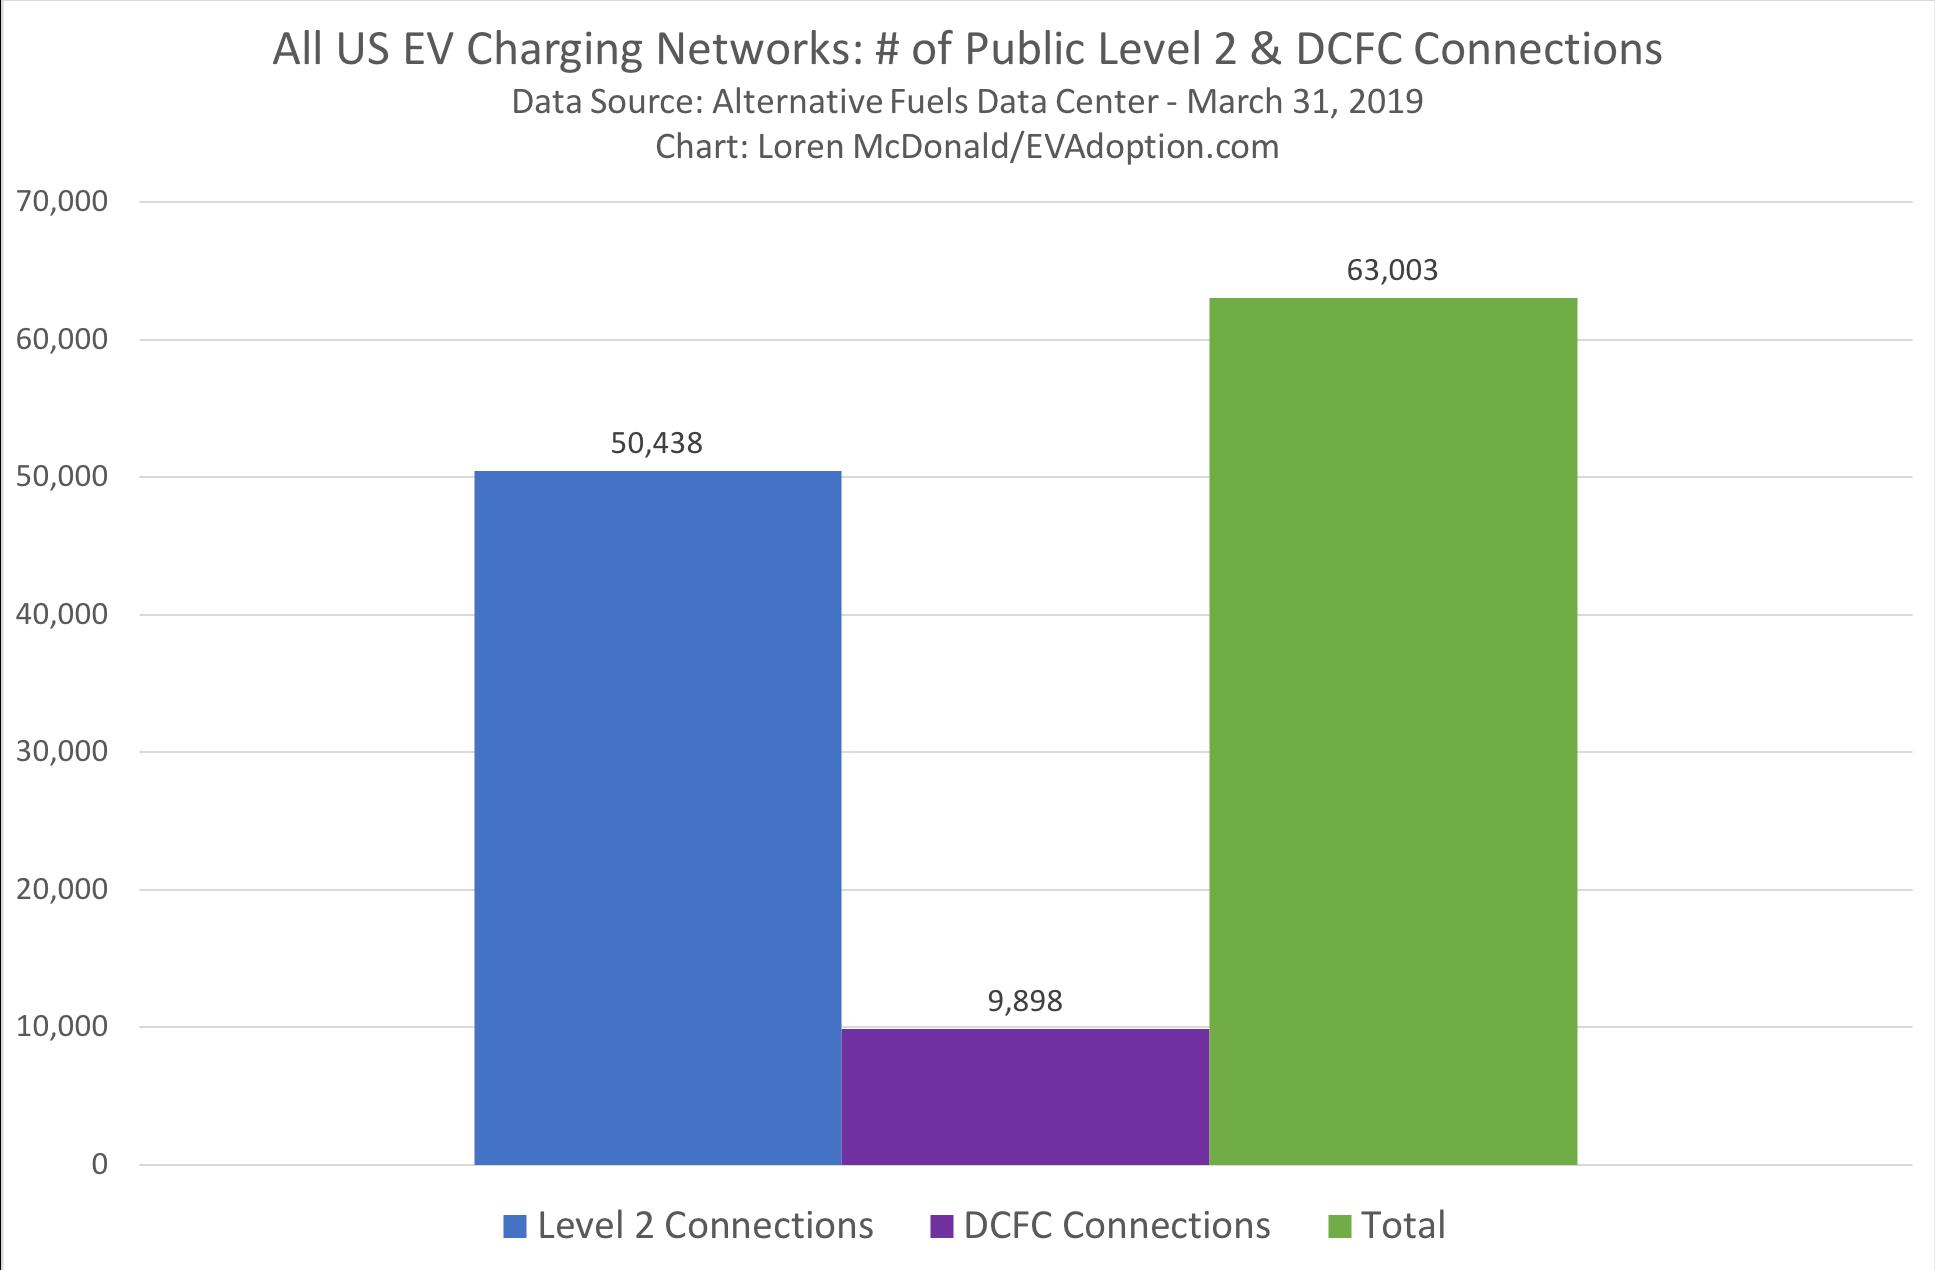 US EV Charging Network Statistics Through March 31, 2019